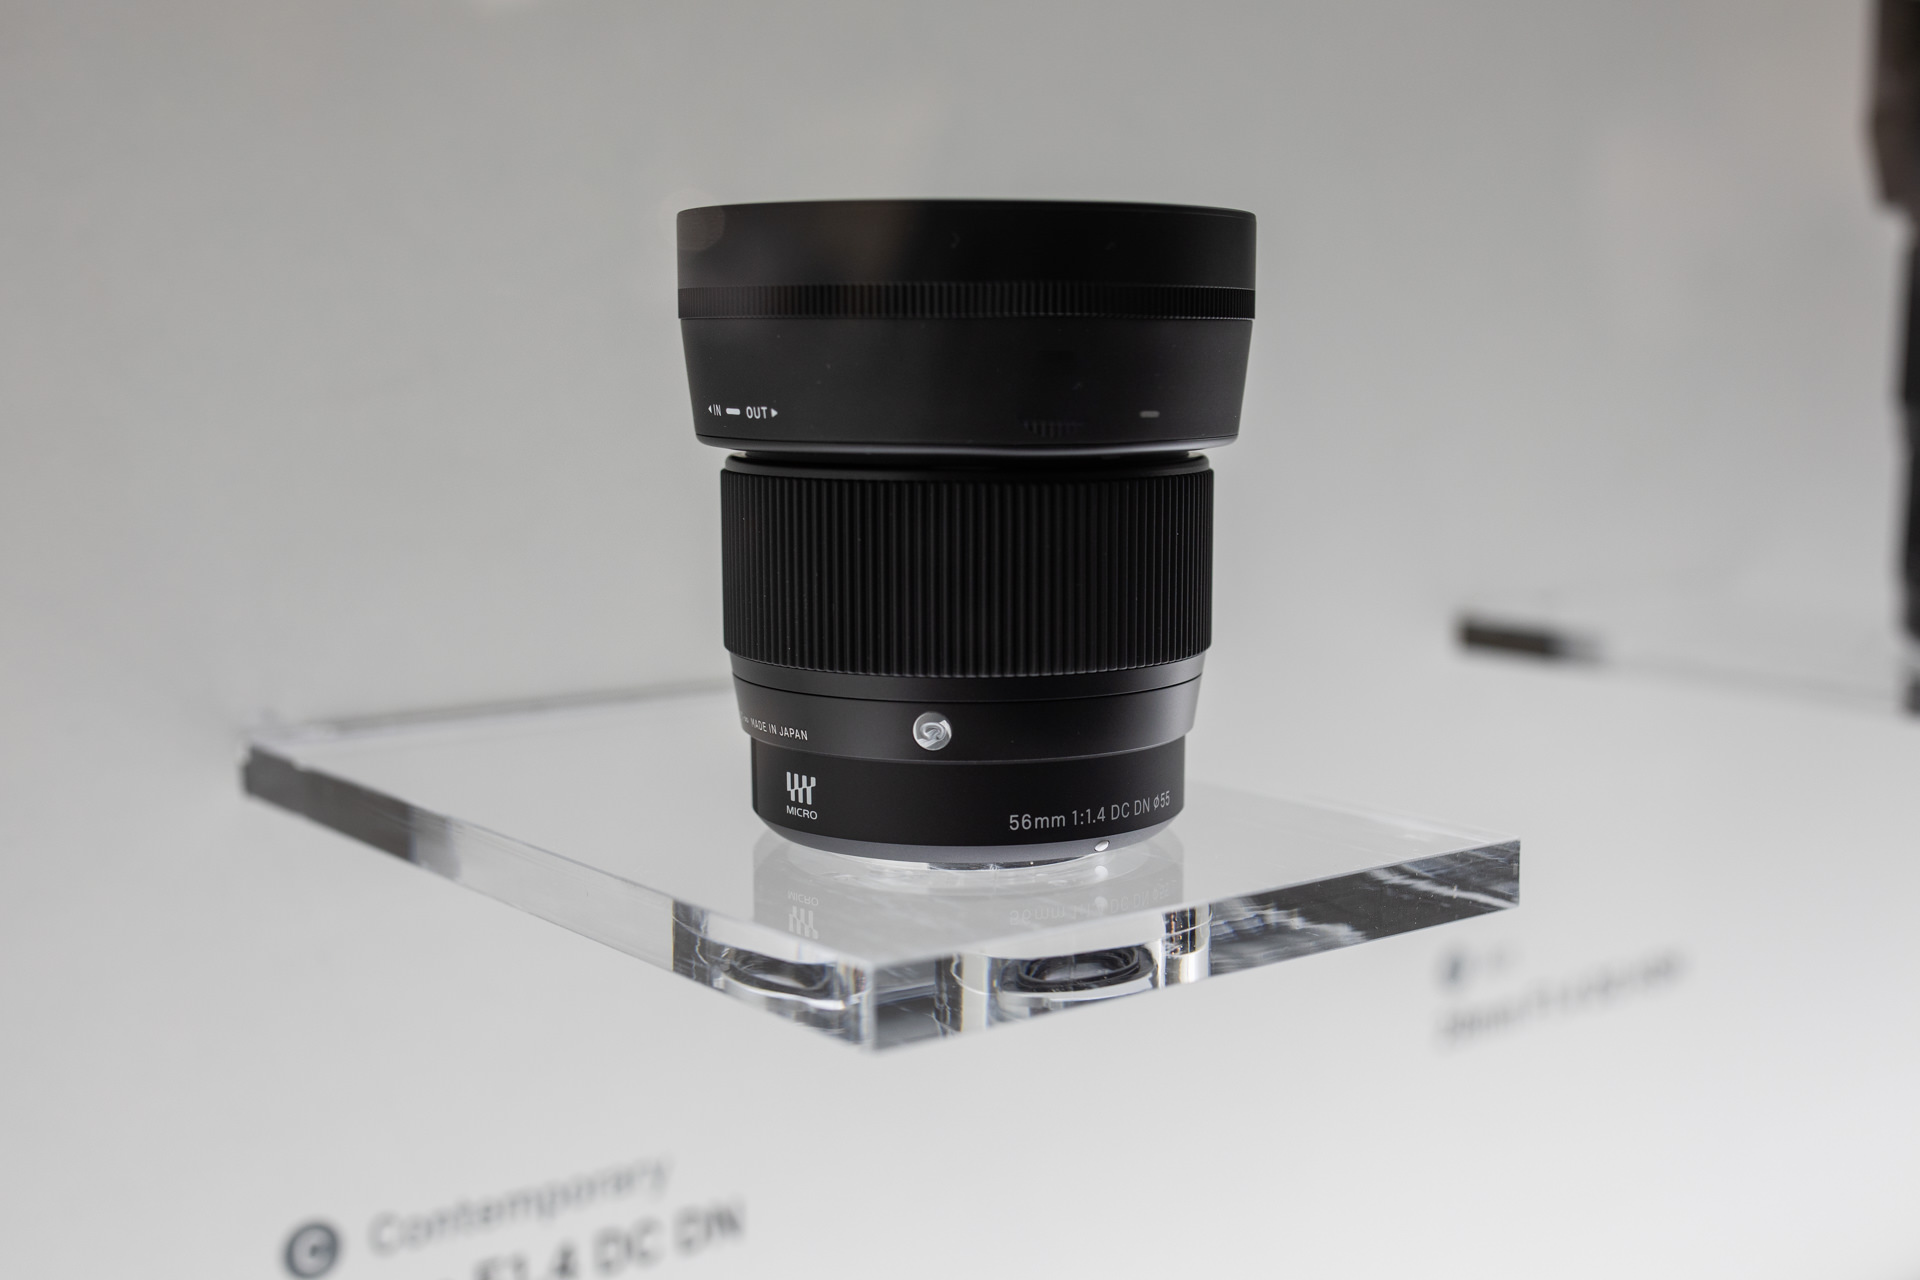 Sigma 56mm 1.4 Contemporary